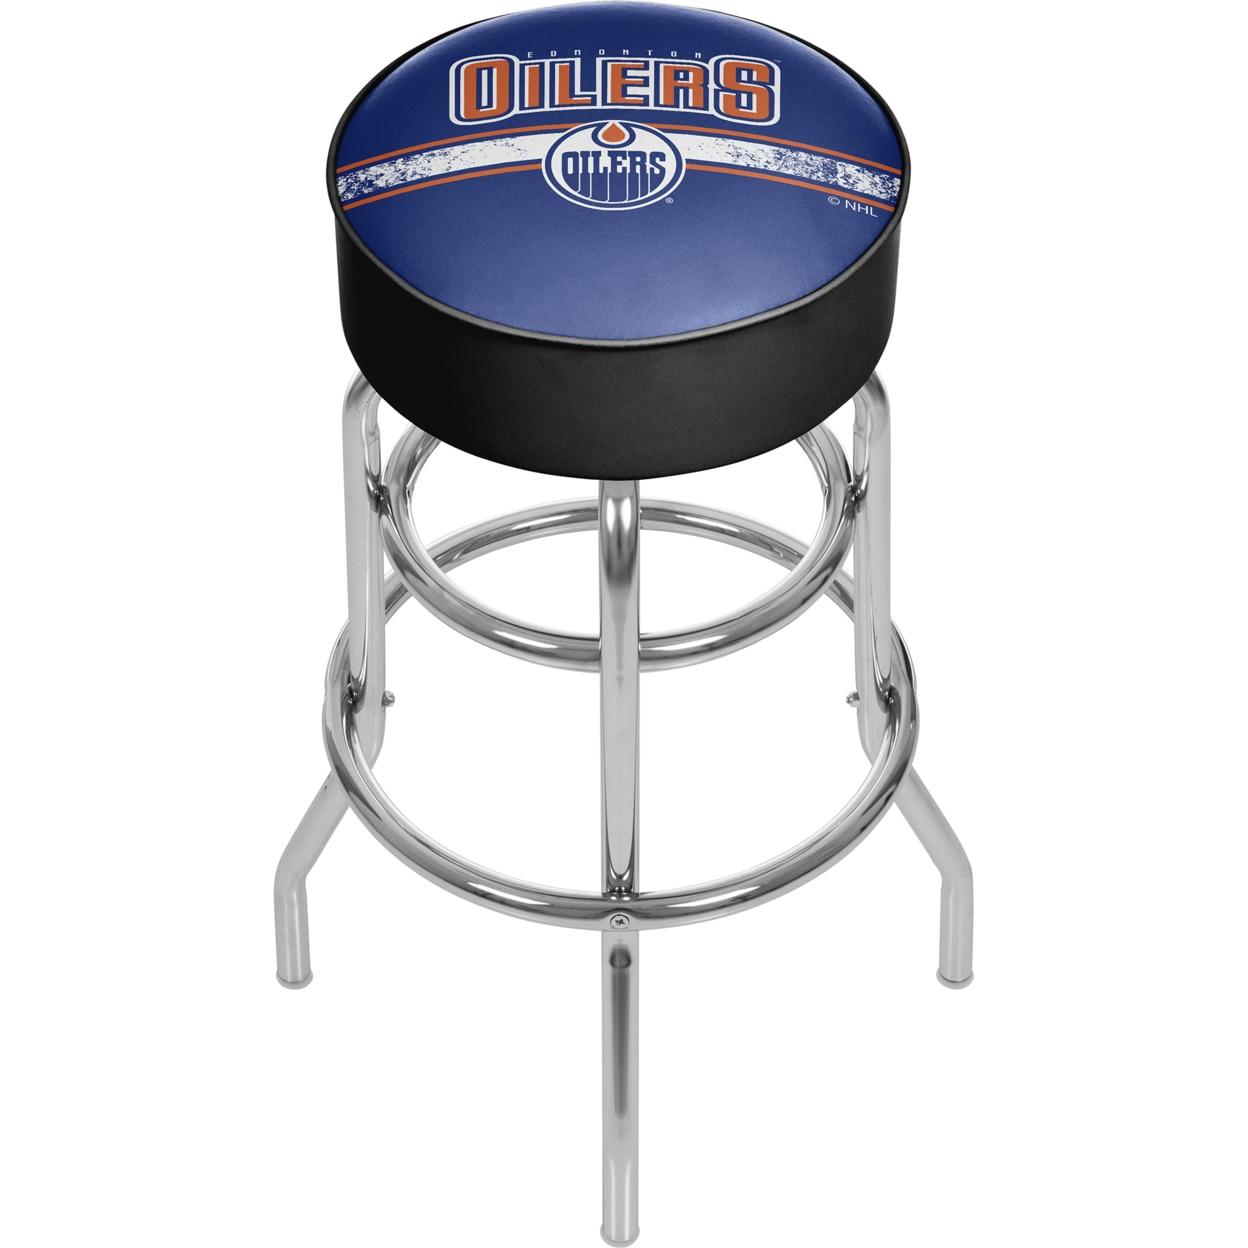 NHL Chrome Padded Swivel Bar Stool 30 Inches High - Edmonton Oilers ohgr edmonton